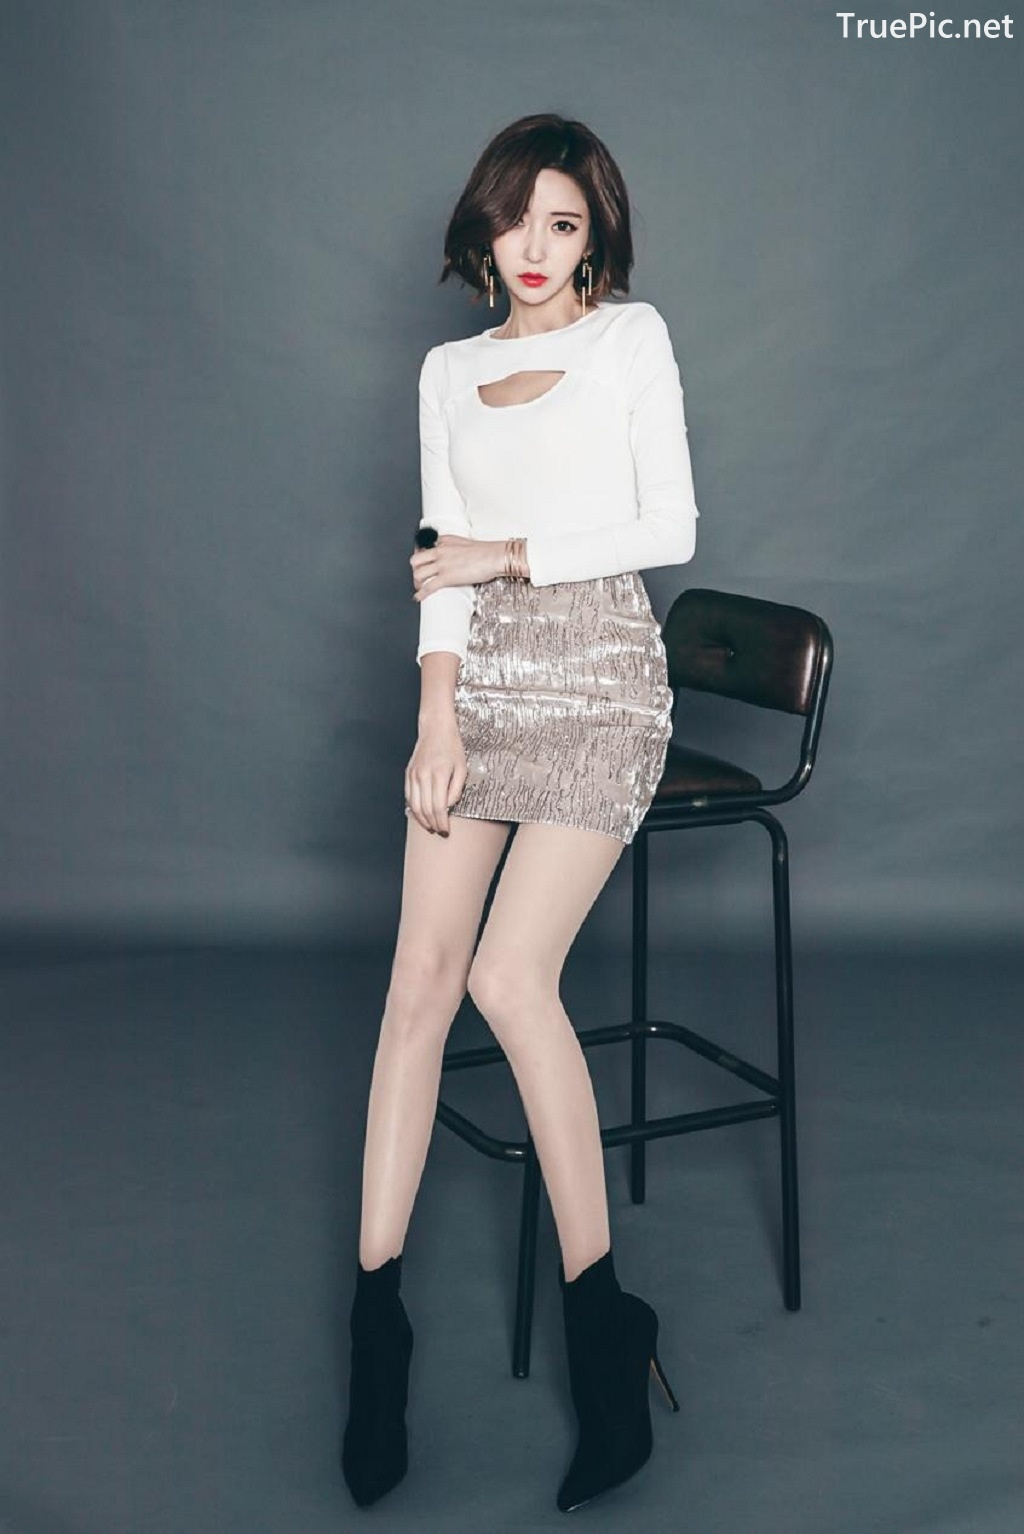 Image Ye Jin - Korean Fashion Model - Studio Photoshoot Collection - TruePic.net - Picture-5